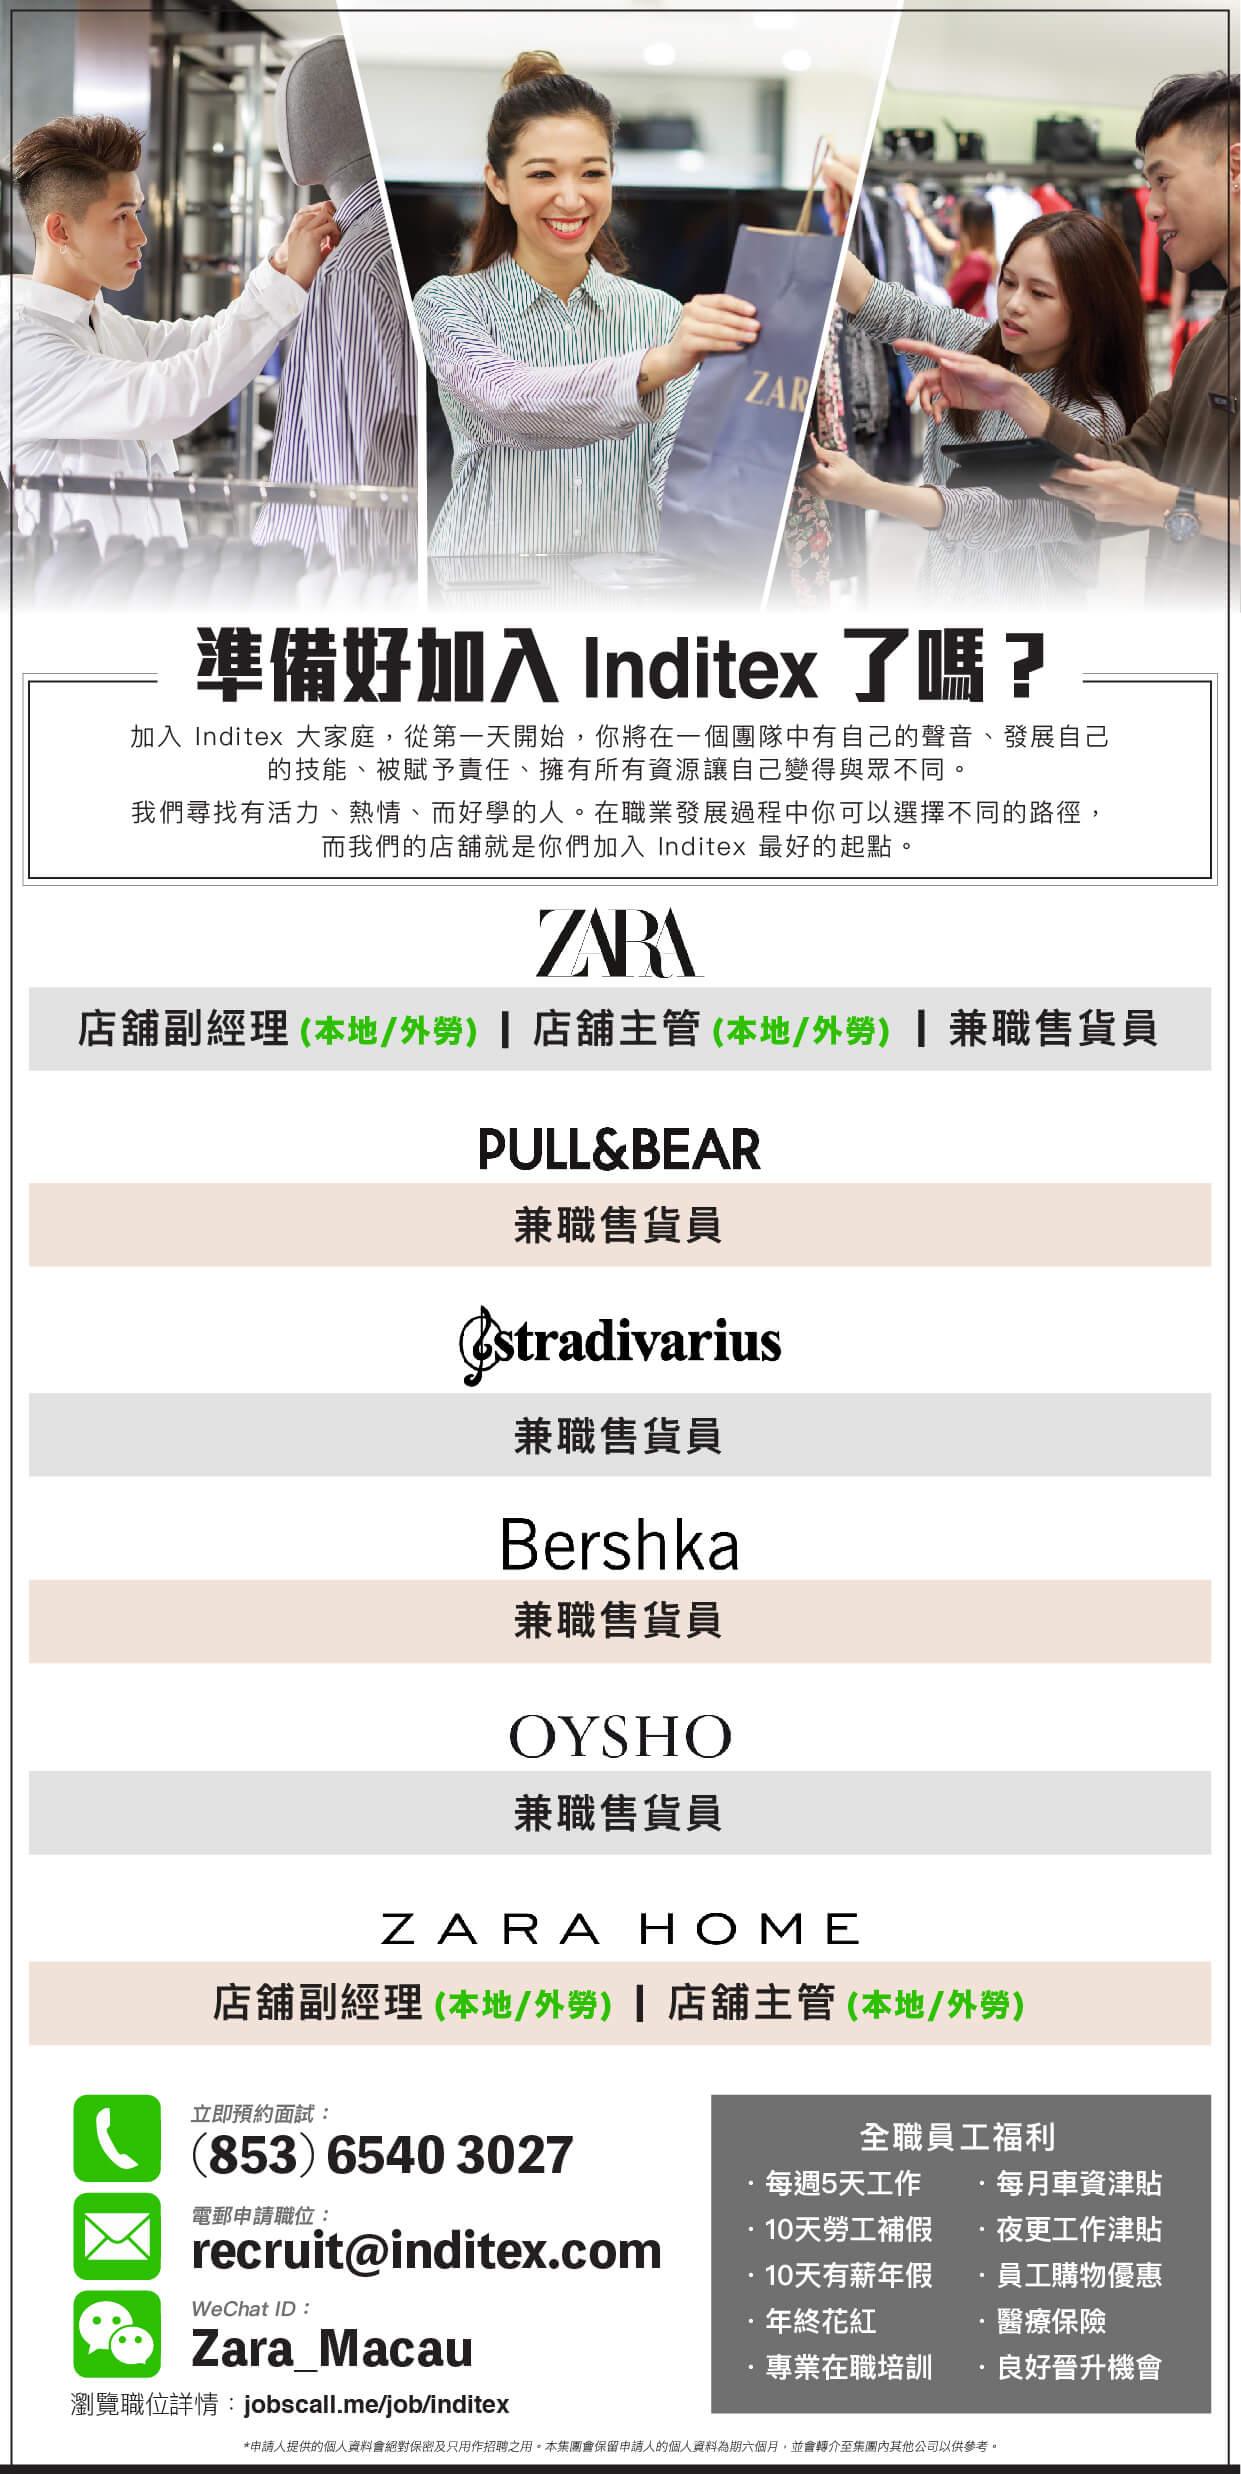 Inditex Poster Design jobscall.me 本地及外勞-01-2.jpg